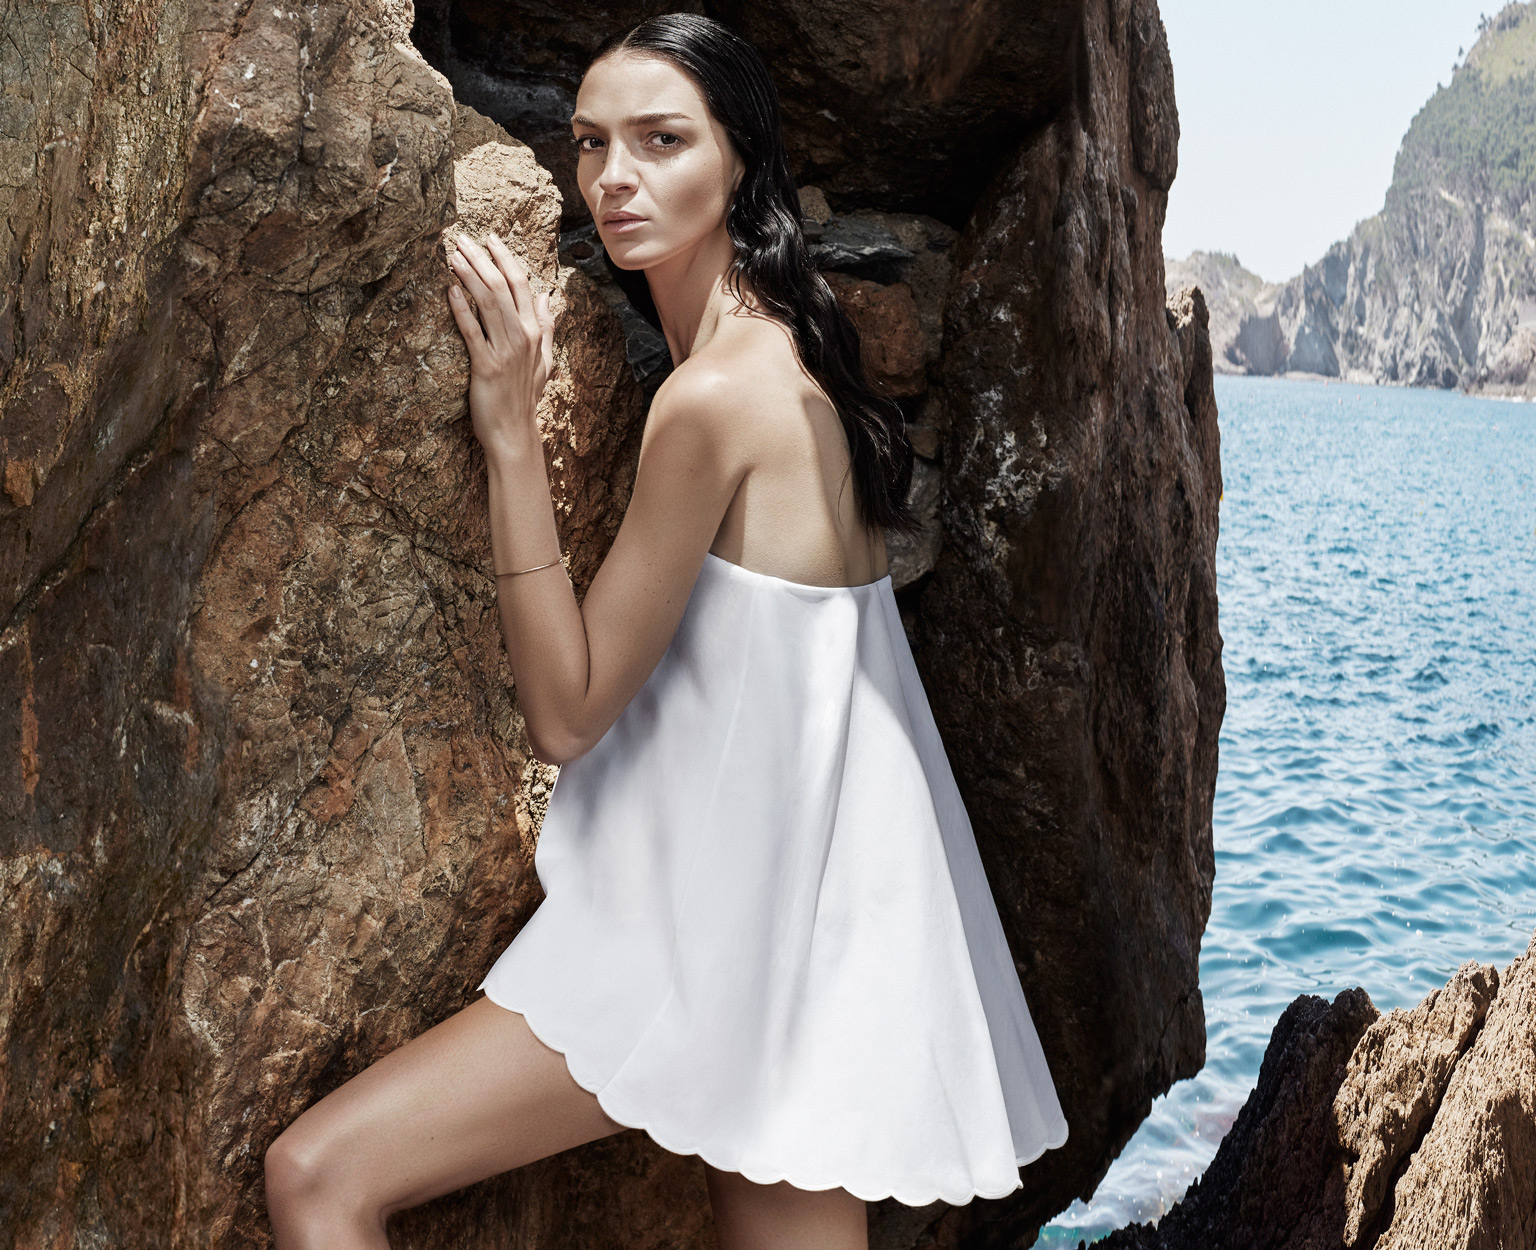 Hot Maria Carla Bonacci Nude Model Pic